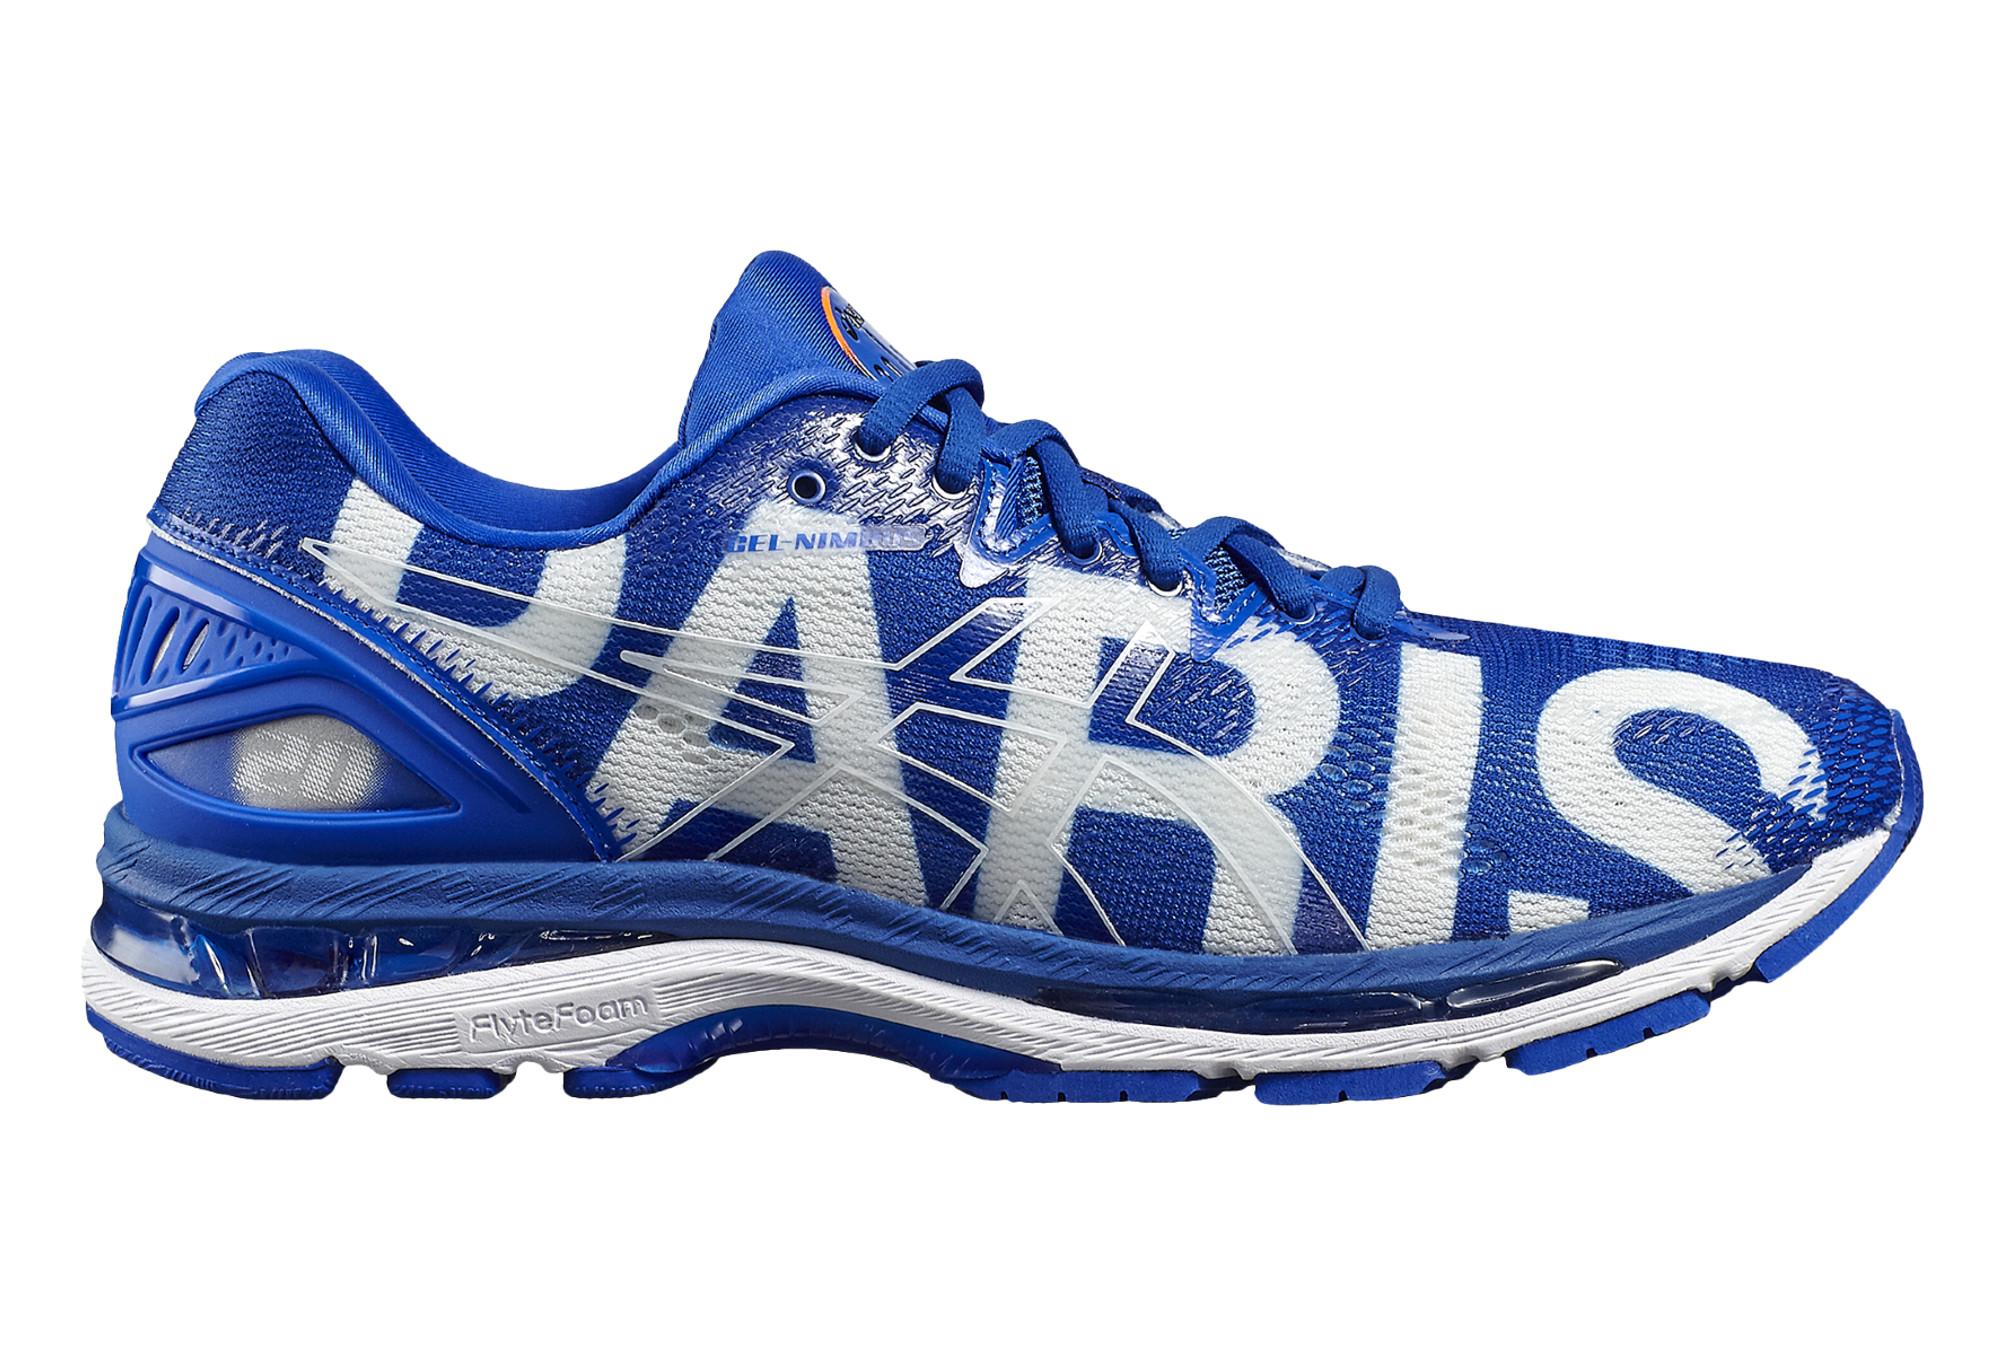 Nimbus 20 Gel Chaussures Marathon Running De Asics Paris UnXWgqRX